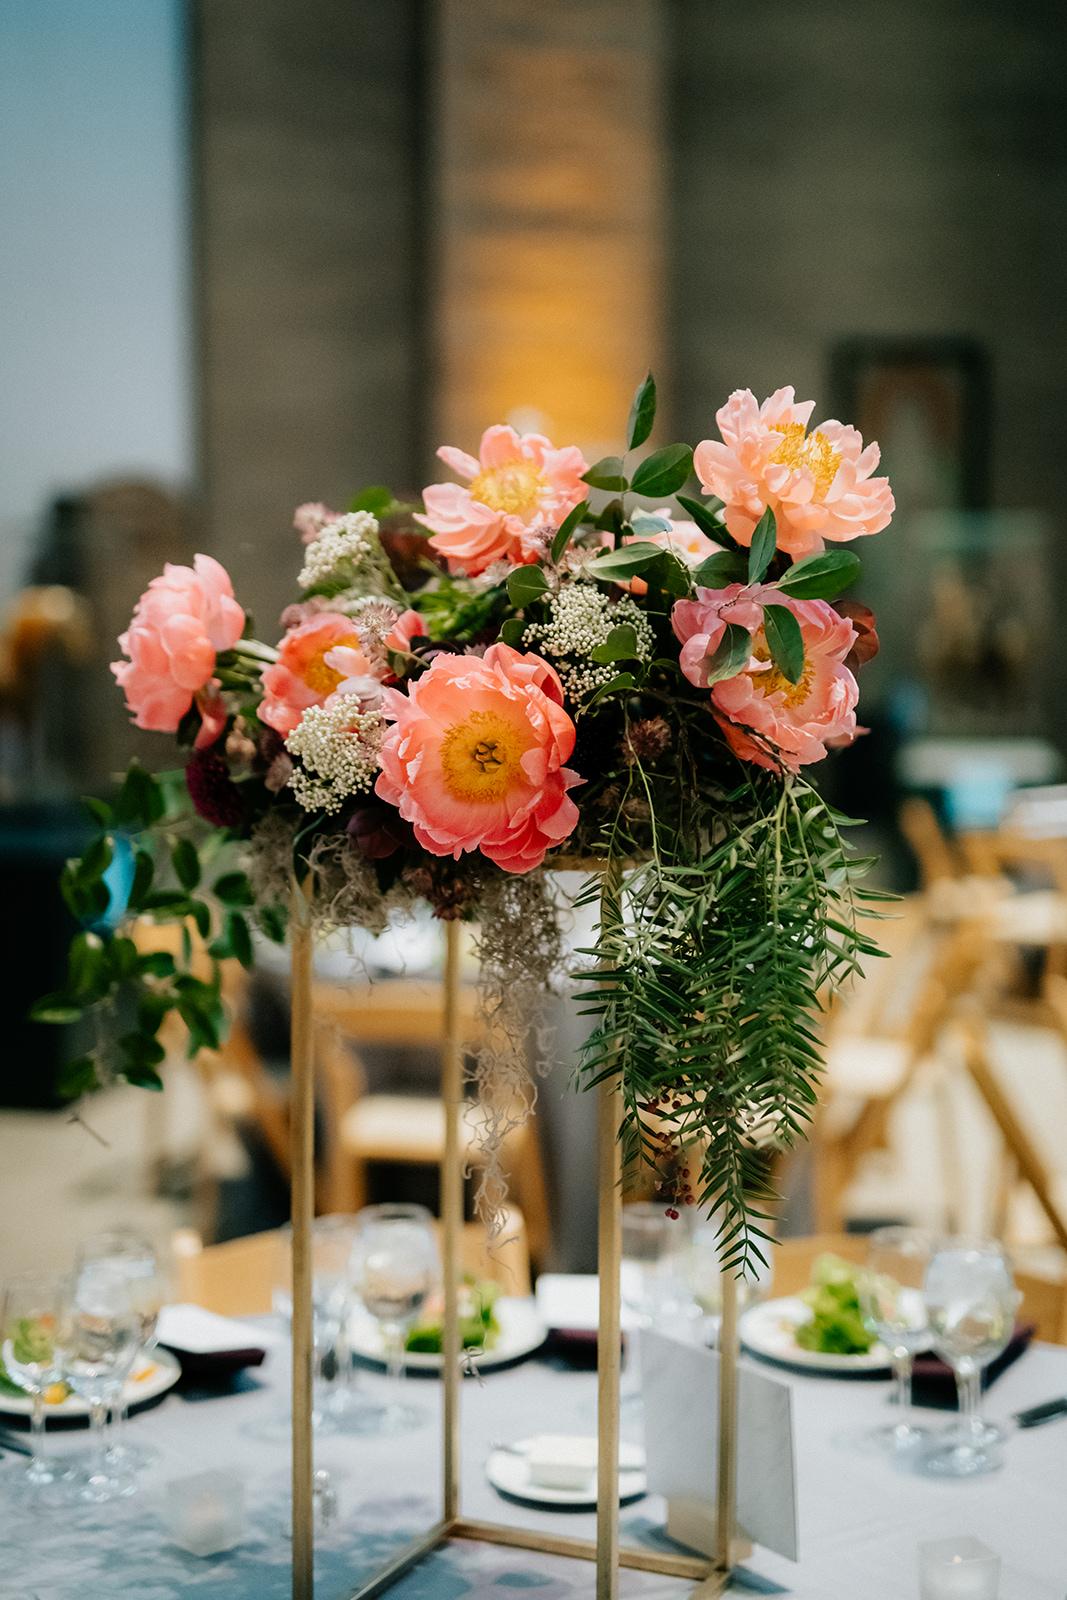 Penn Museum wedding lush organic floral centerpieces with northeast wedding planner Heart & Dash